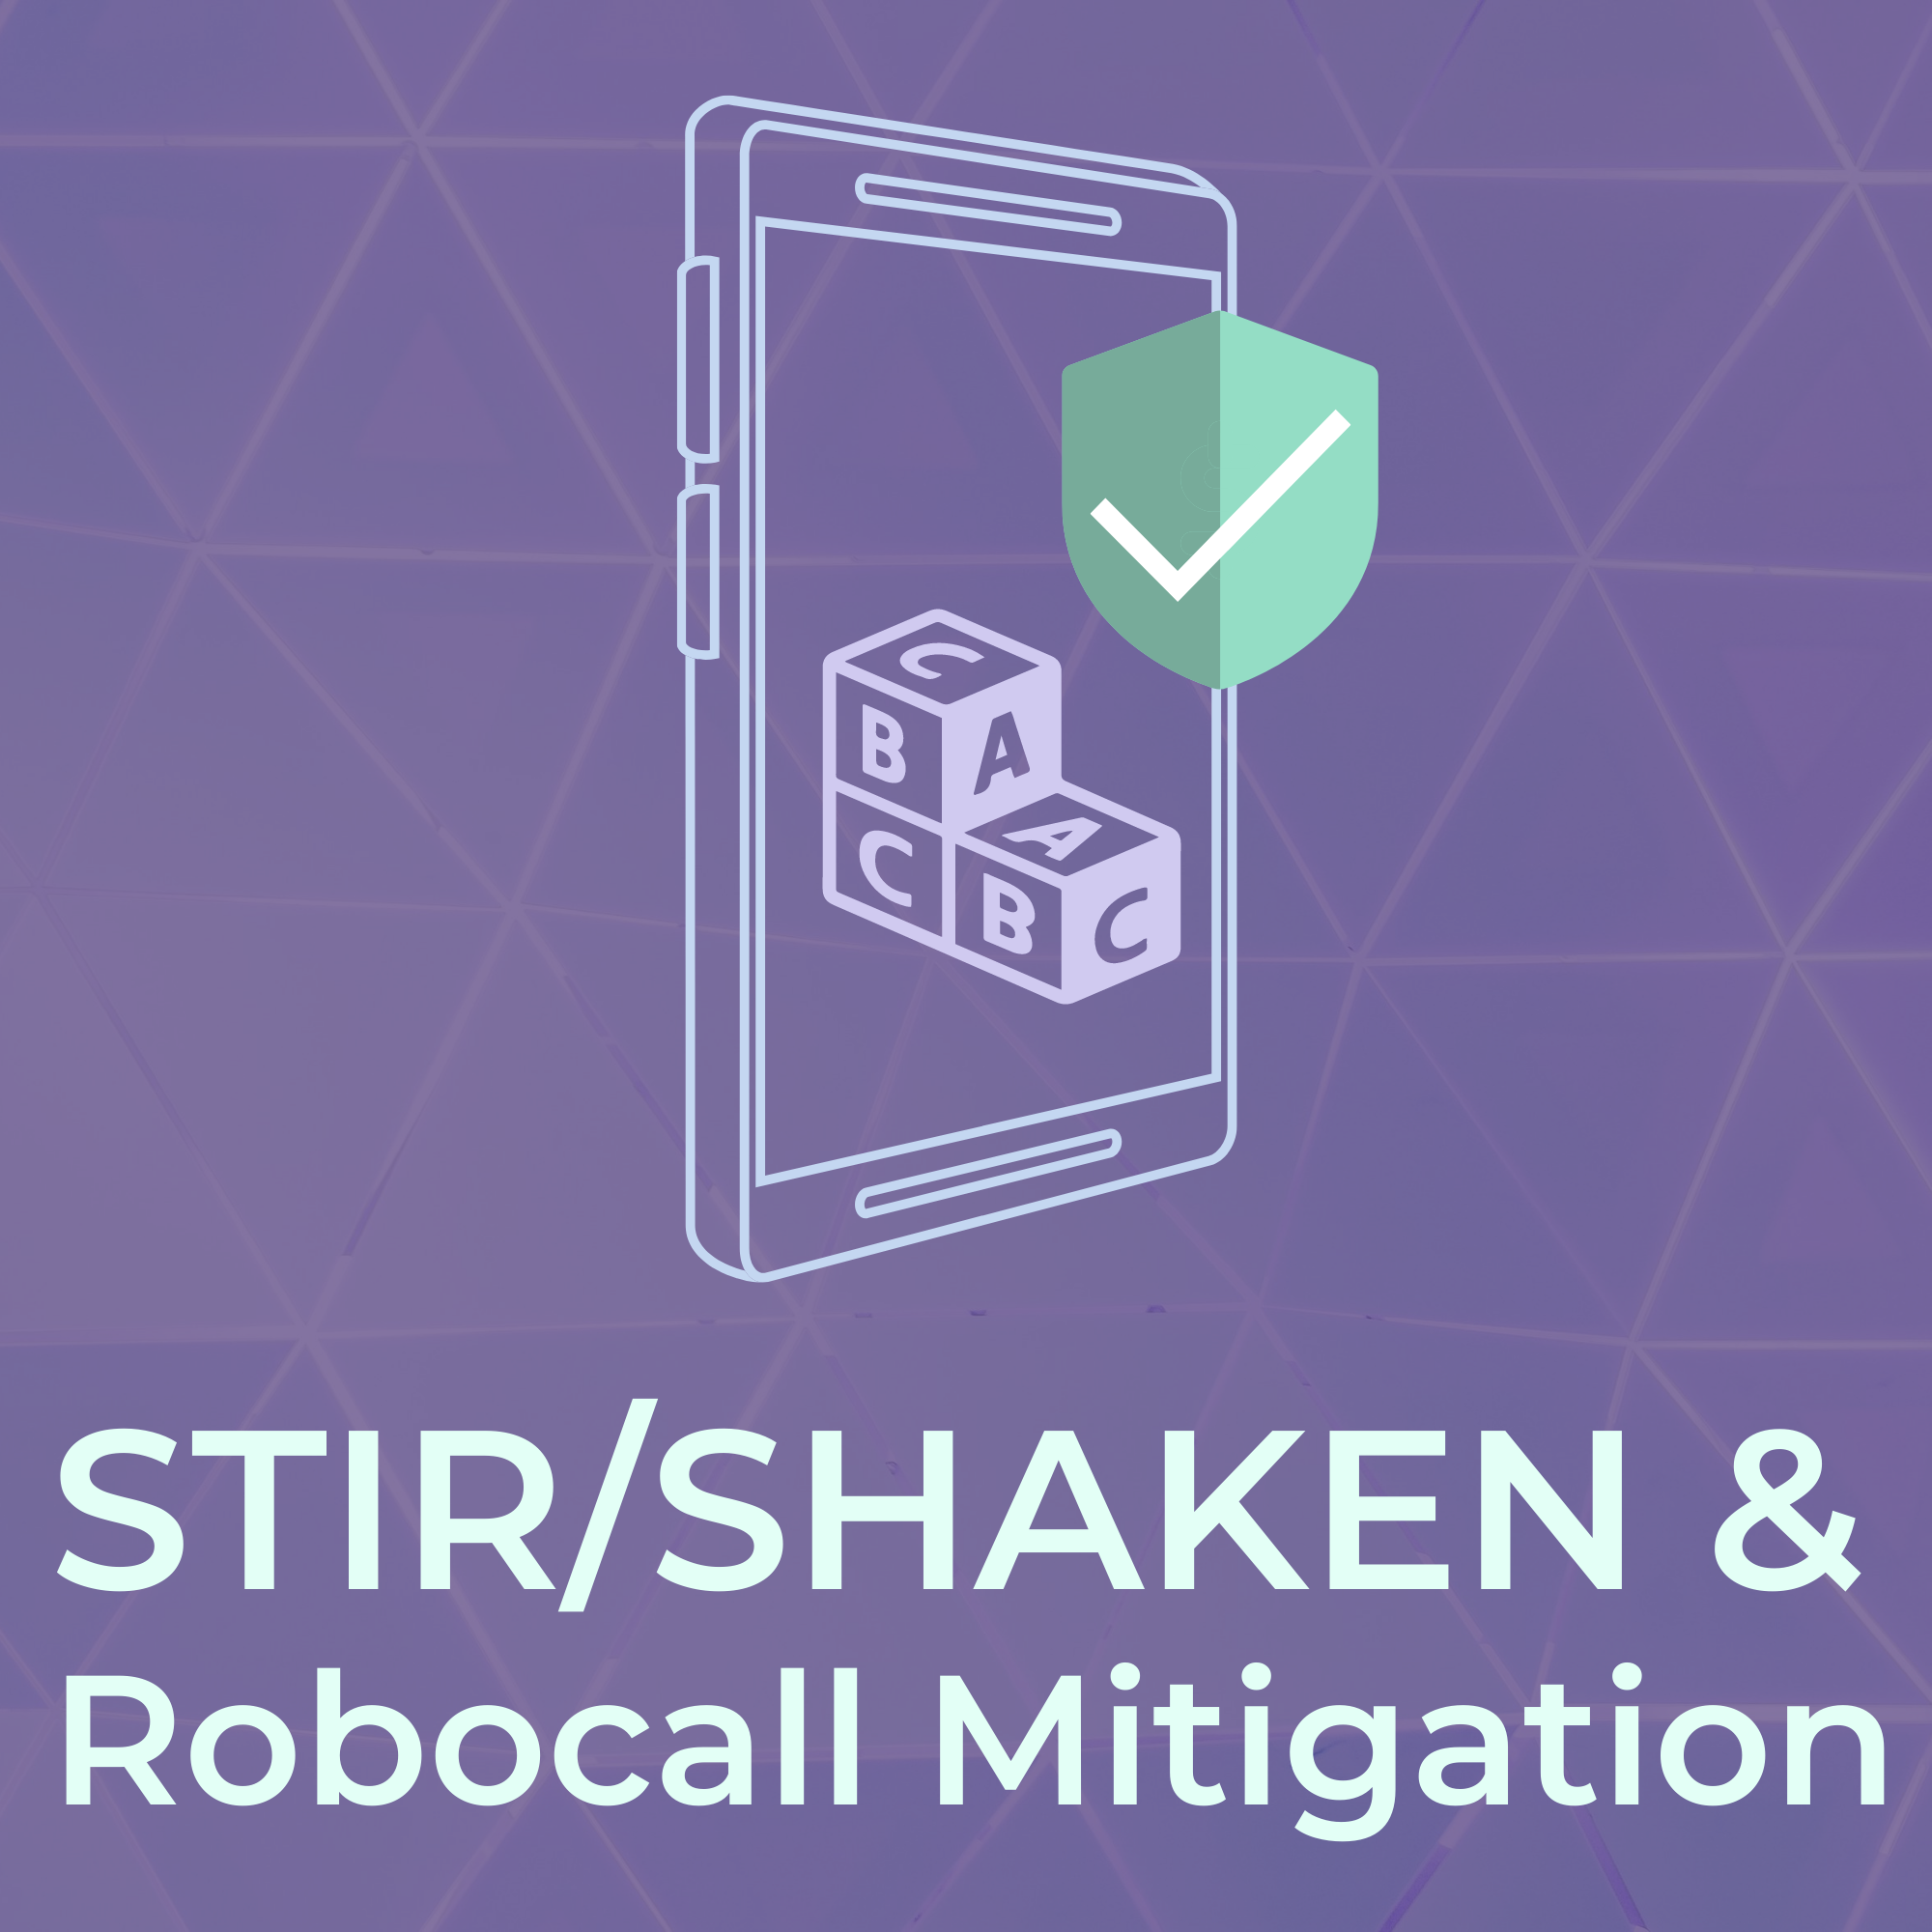 Tuesday Talks Collection - STIR/SHAKEN & Robocall Mitigation